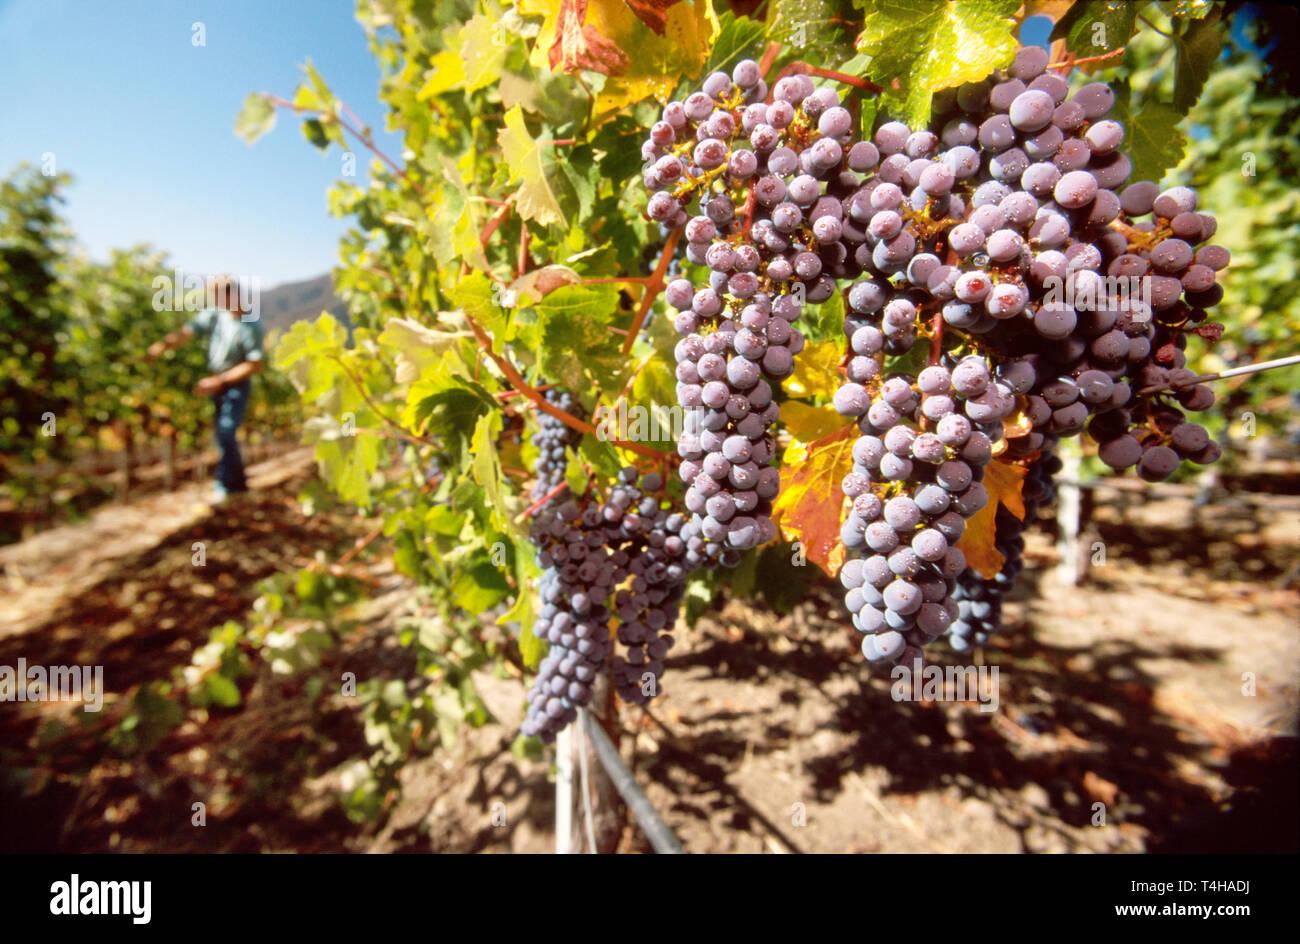 California Monterey County Carmel Valley Bernardus Marinus Vineyard Cabernet grapes before harvest - Stock Image